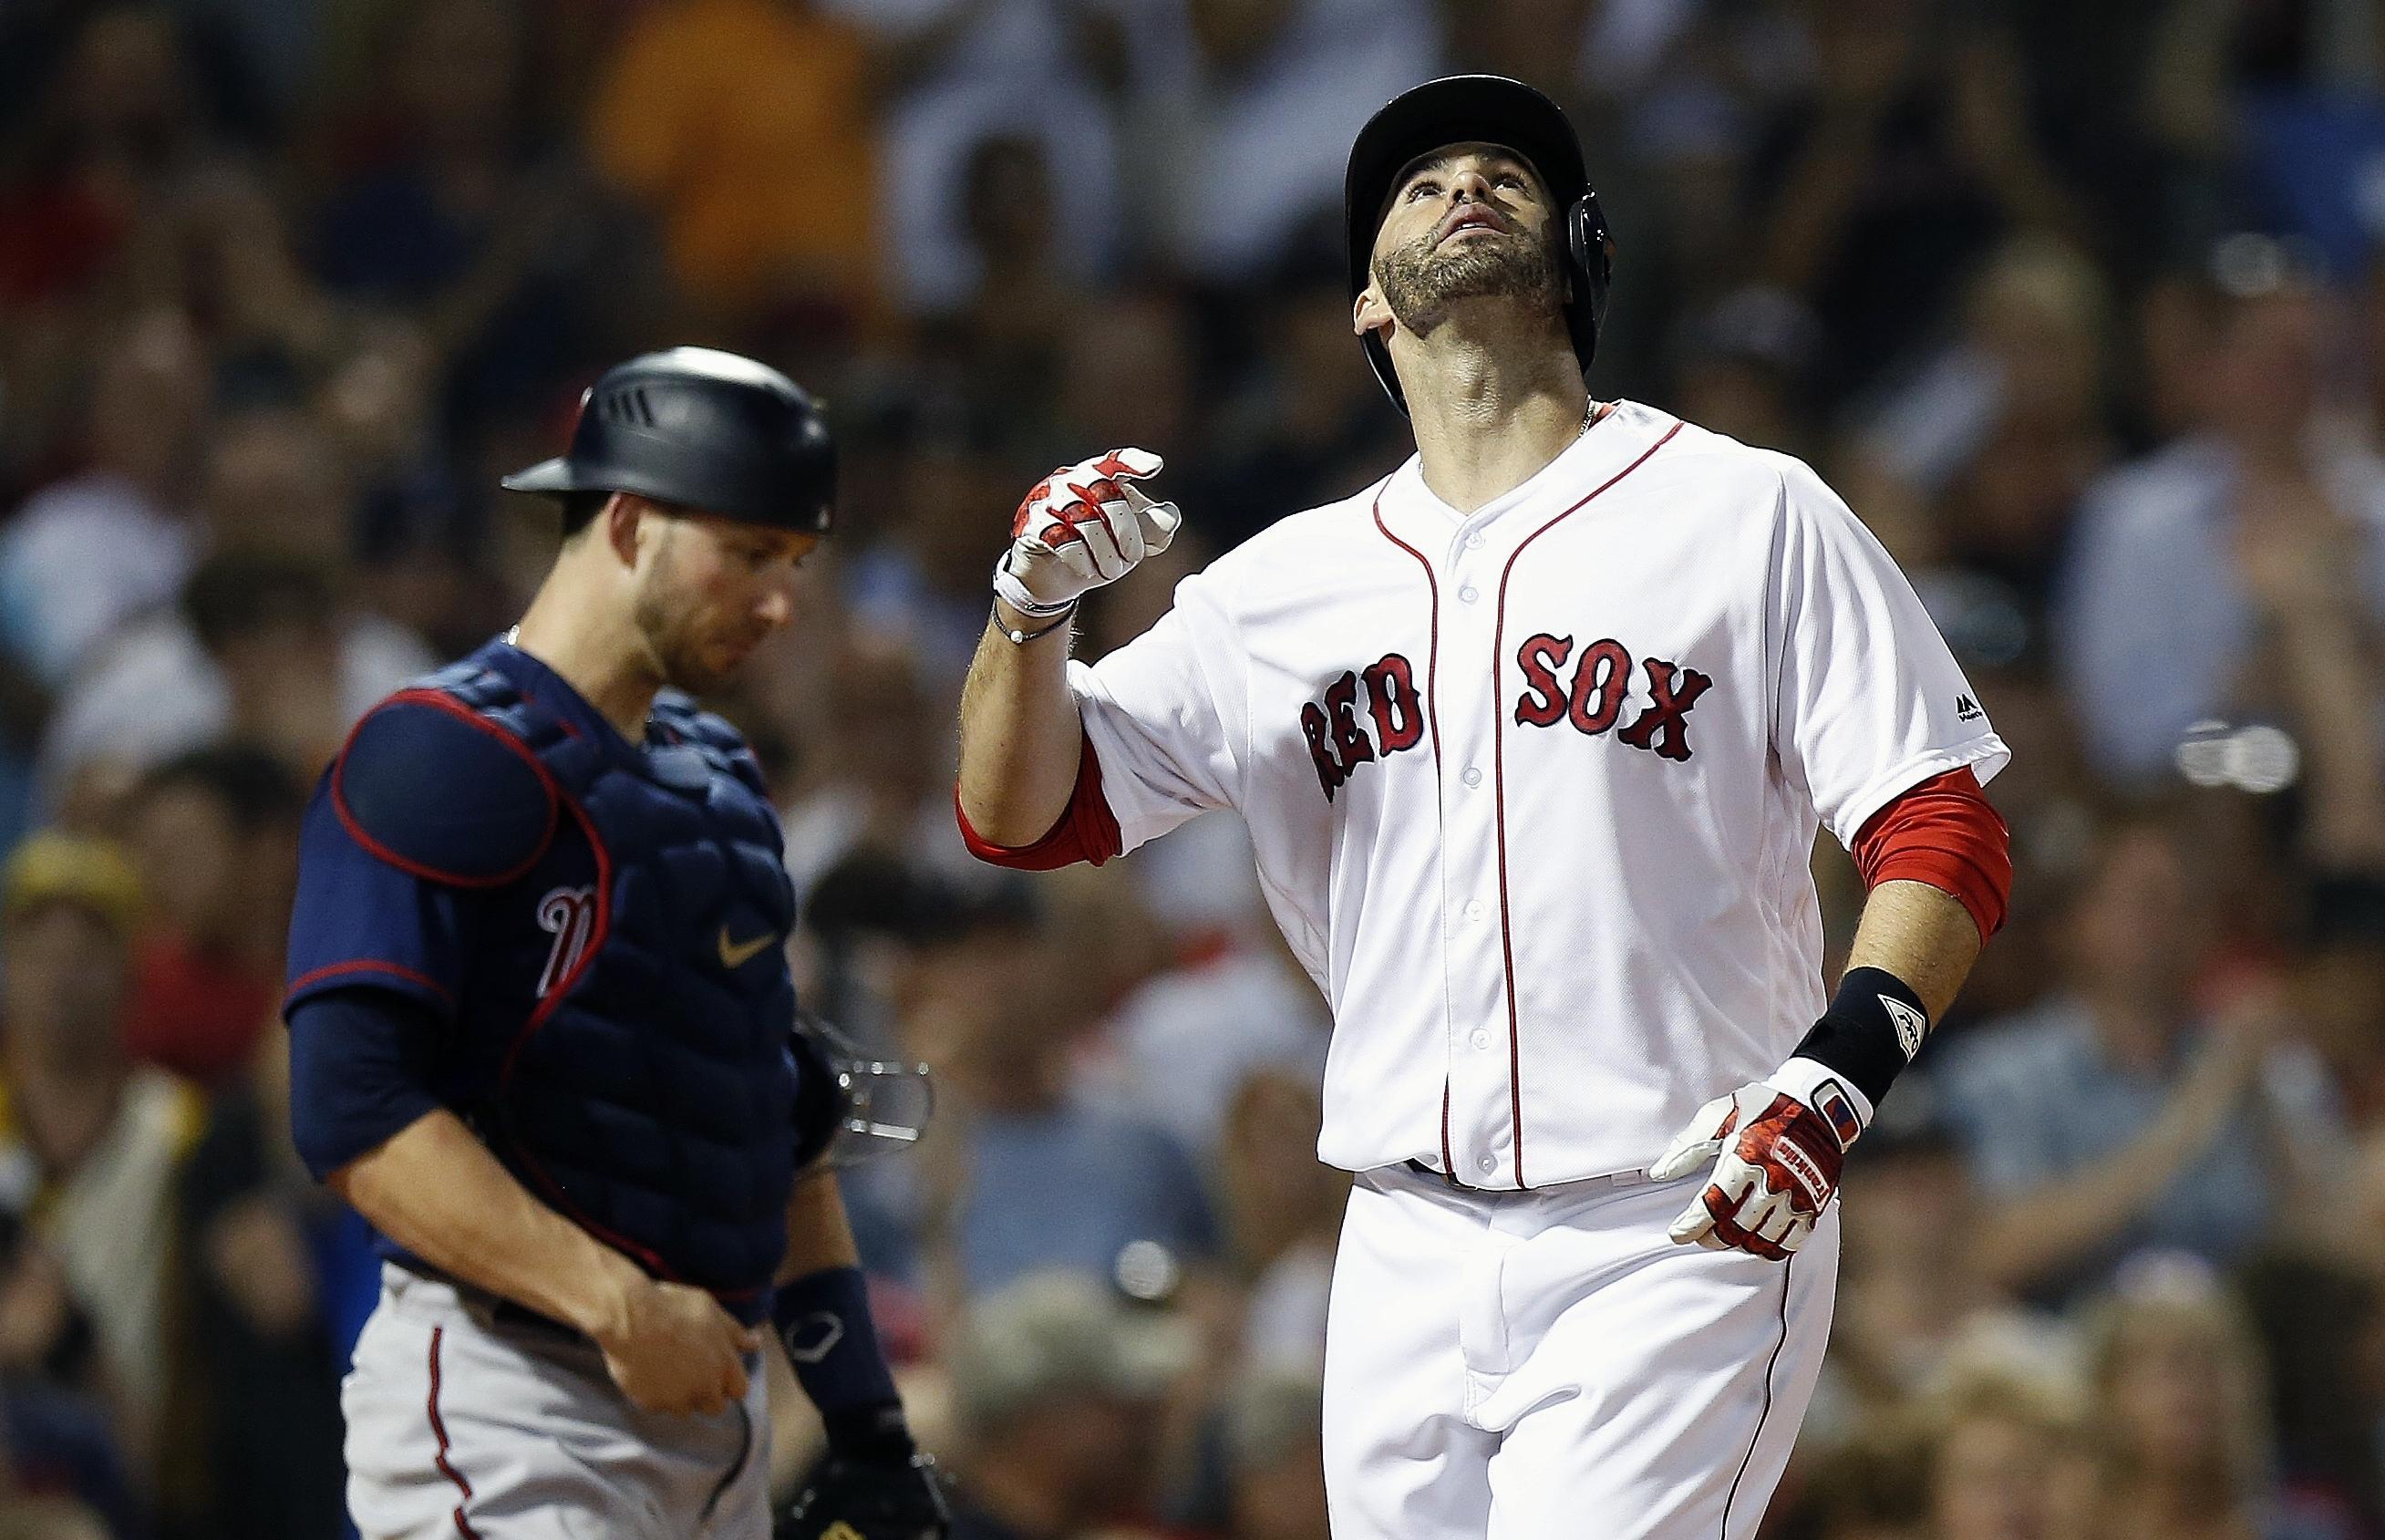 2a7b33092 MLB roundup  J.D. Martinez hit his major league-leading 32nd homer ...